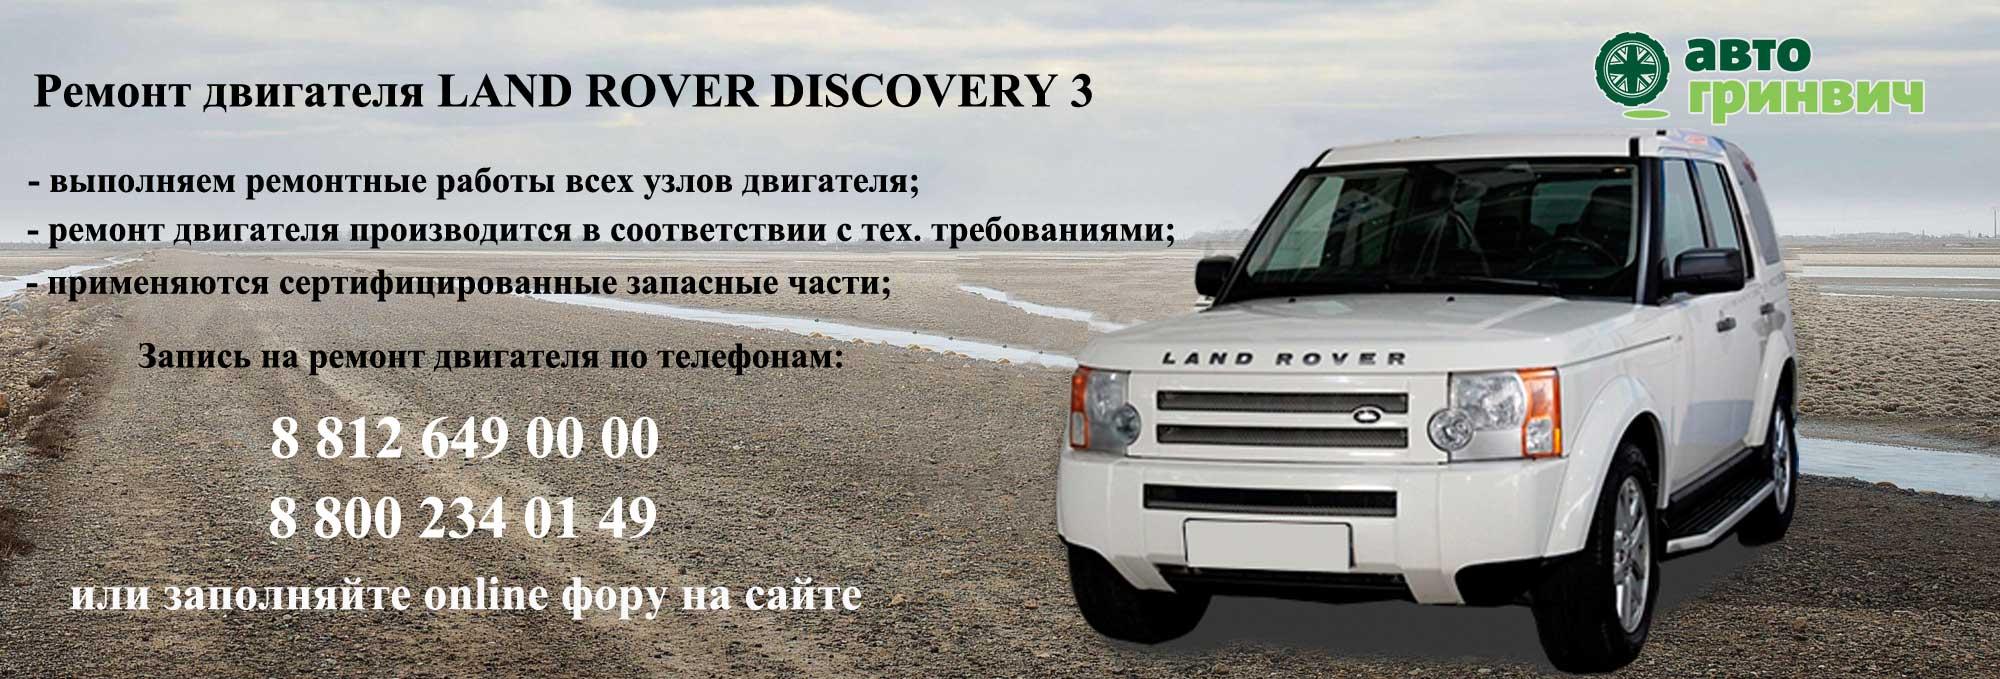 Ремонт двигателя Discovery 3